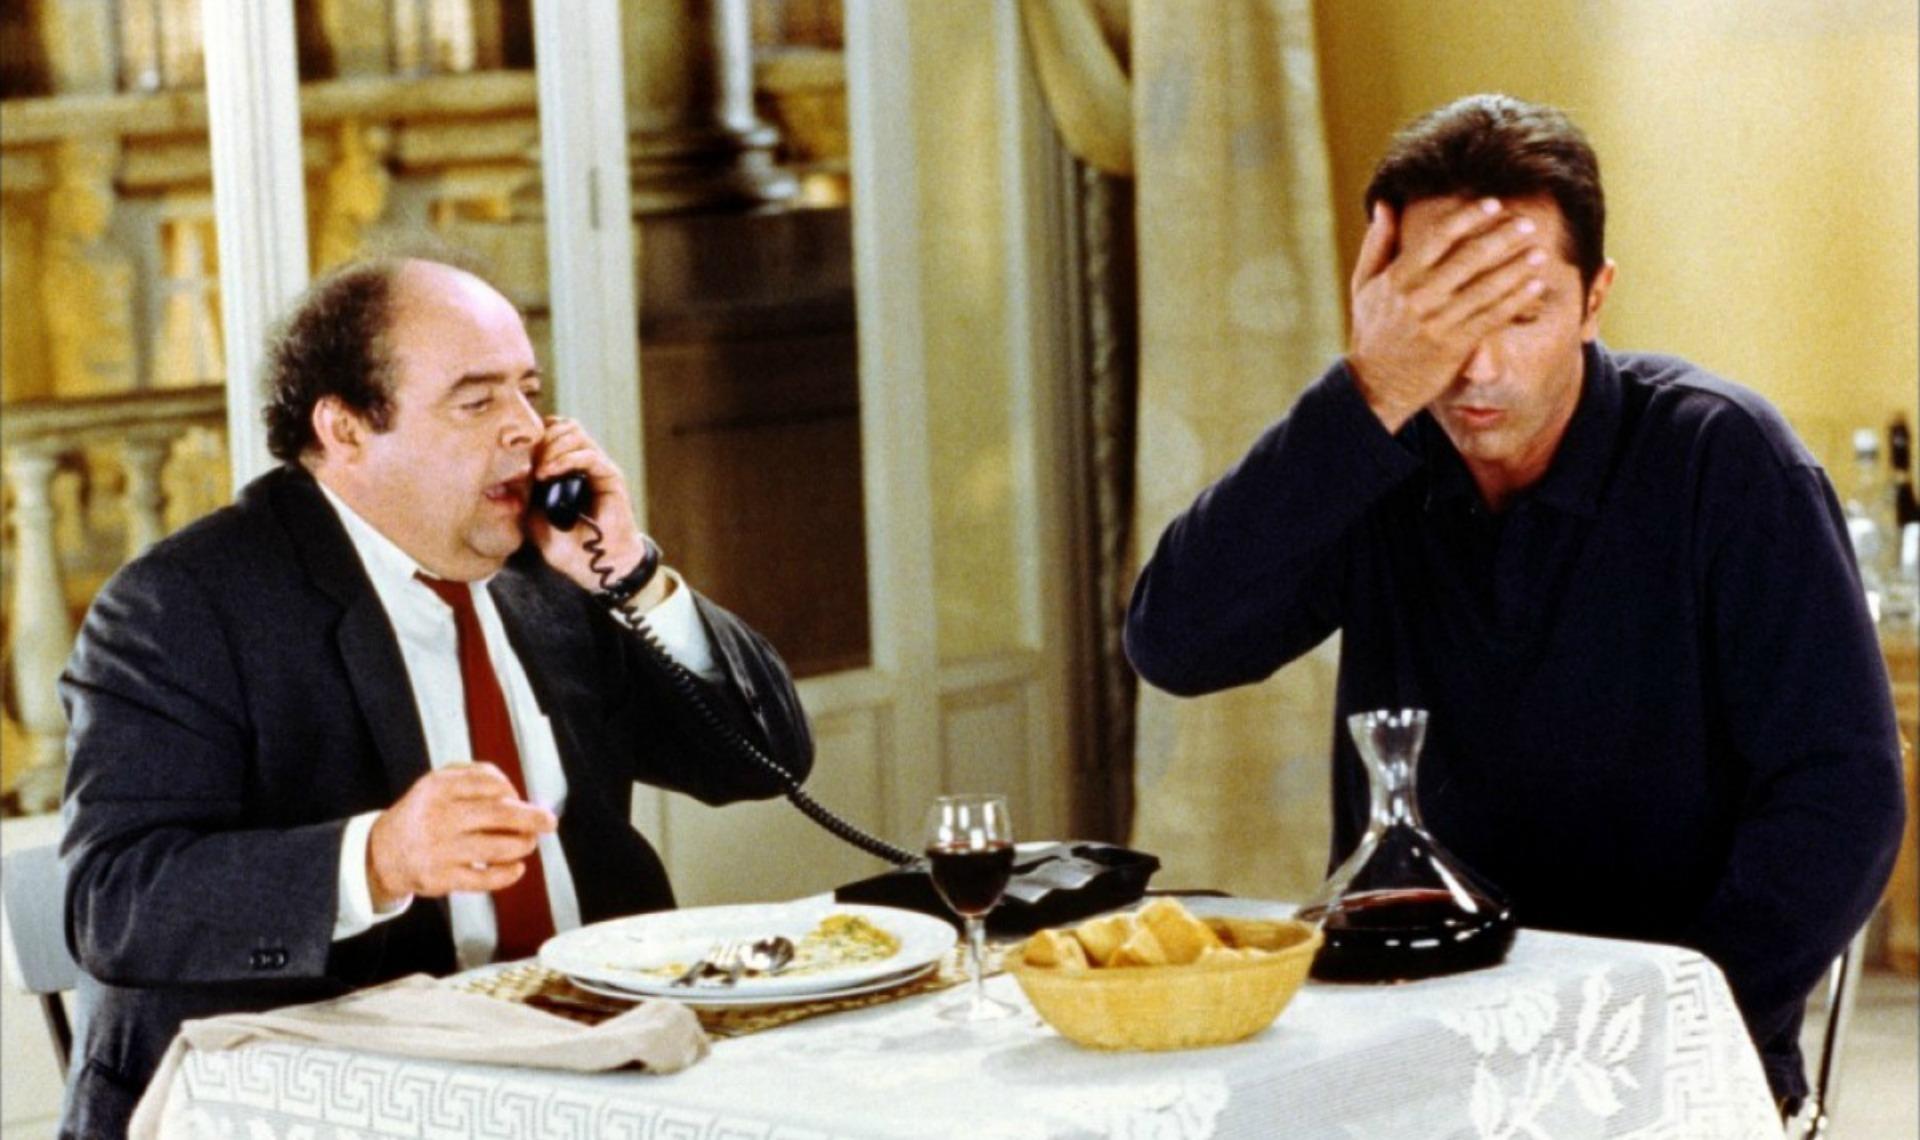 diner lobbying dans Goldman Sachs